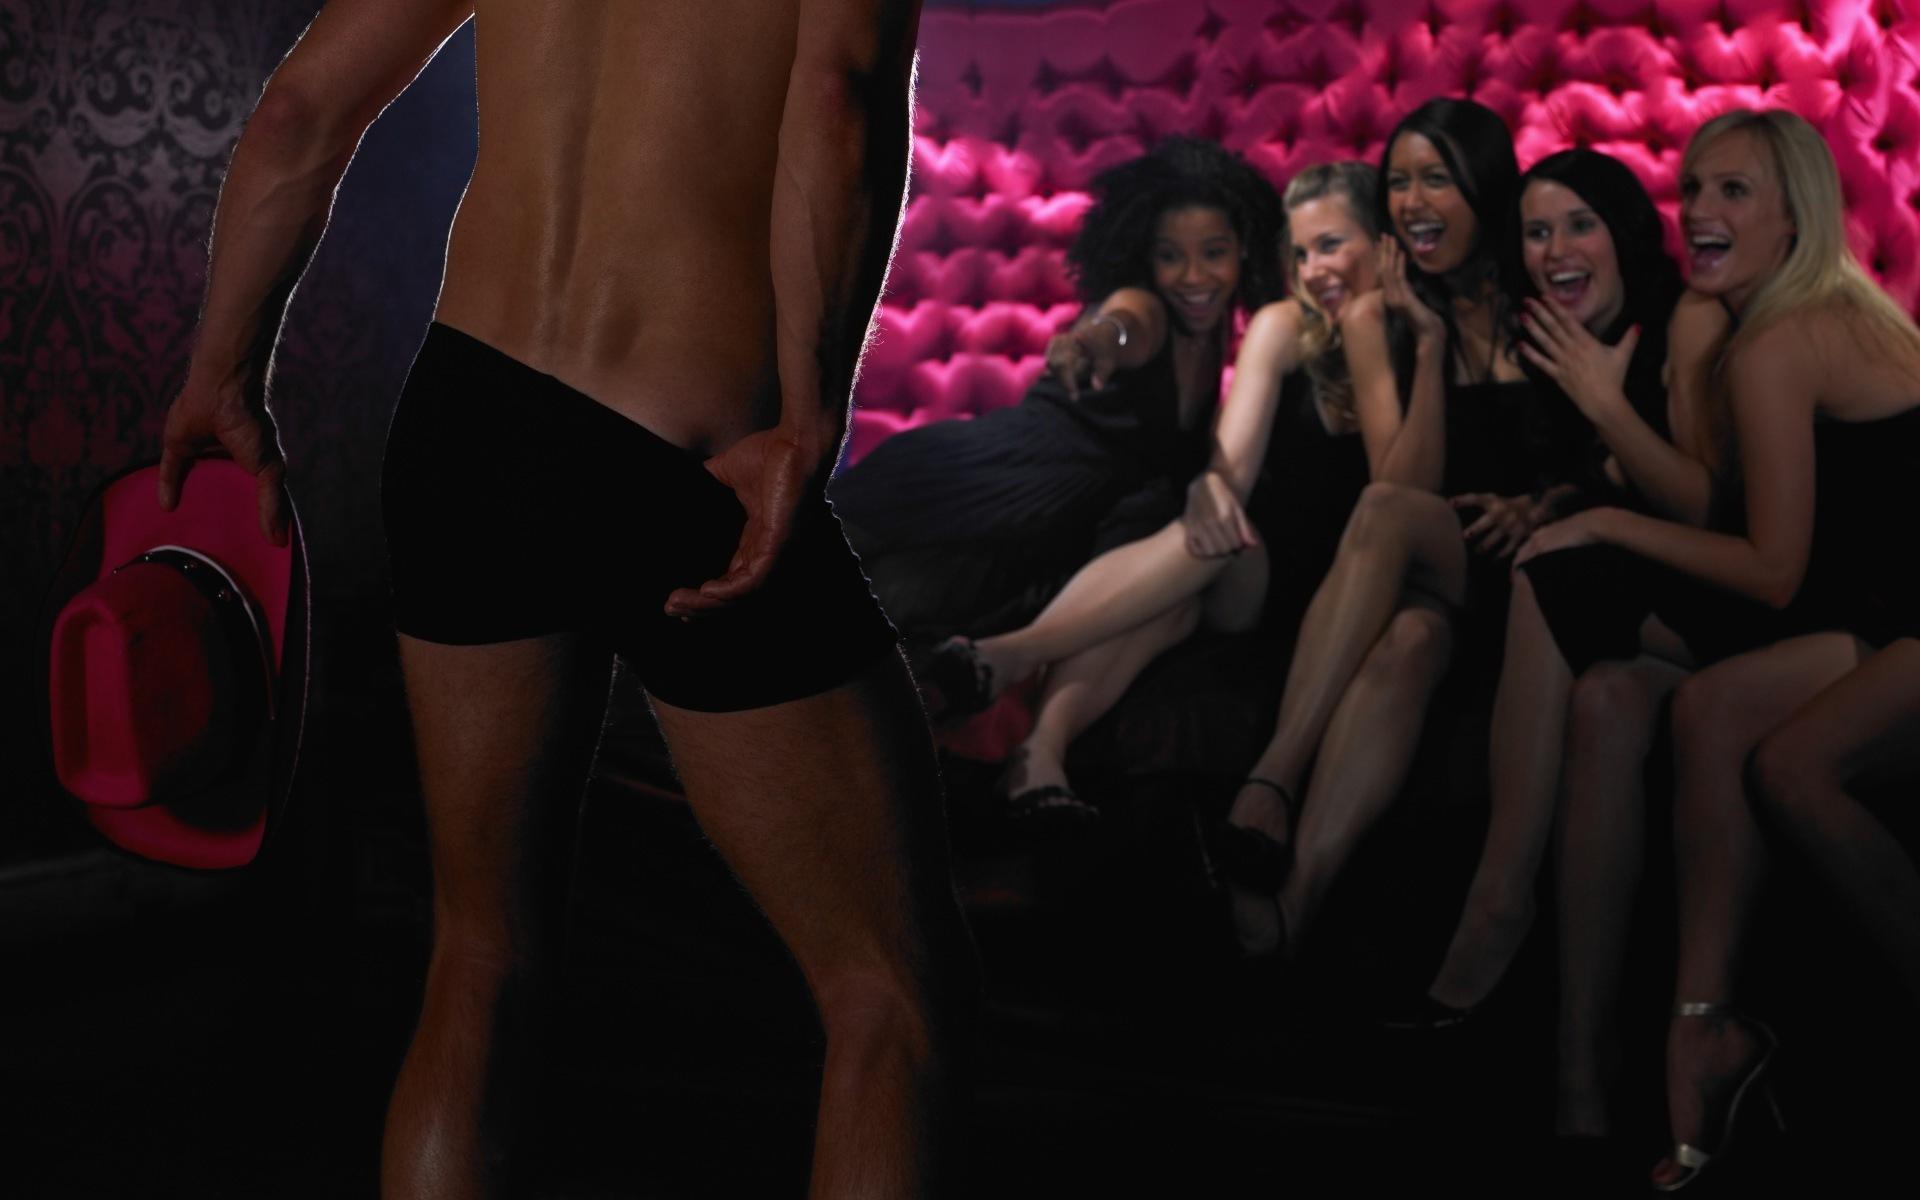 Отдохнули на девичнике видео, девушки извращенцы порно